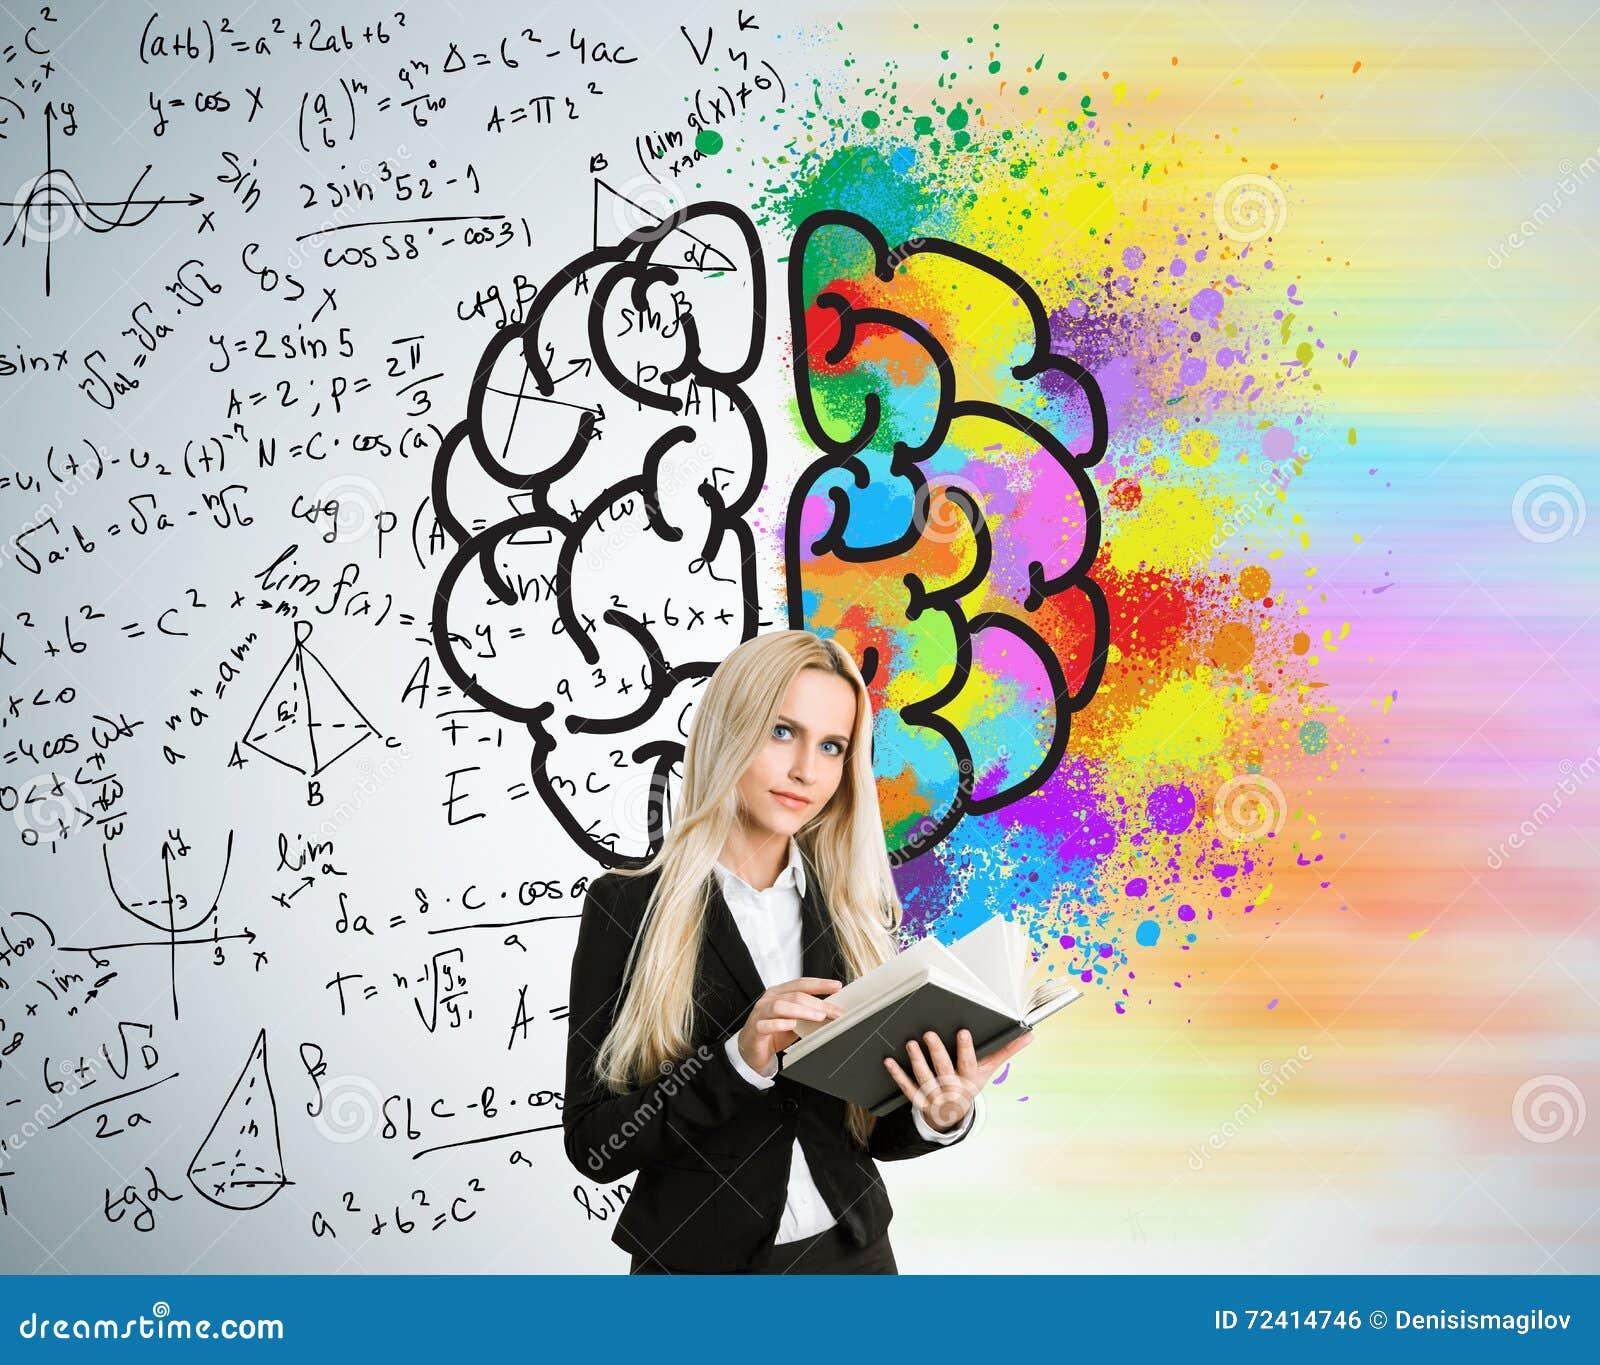 Different hemispheres stock illustration  Illustration of creative